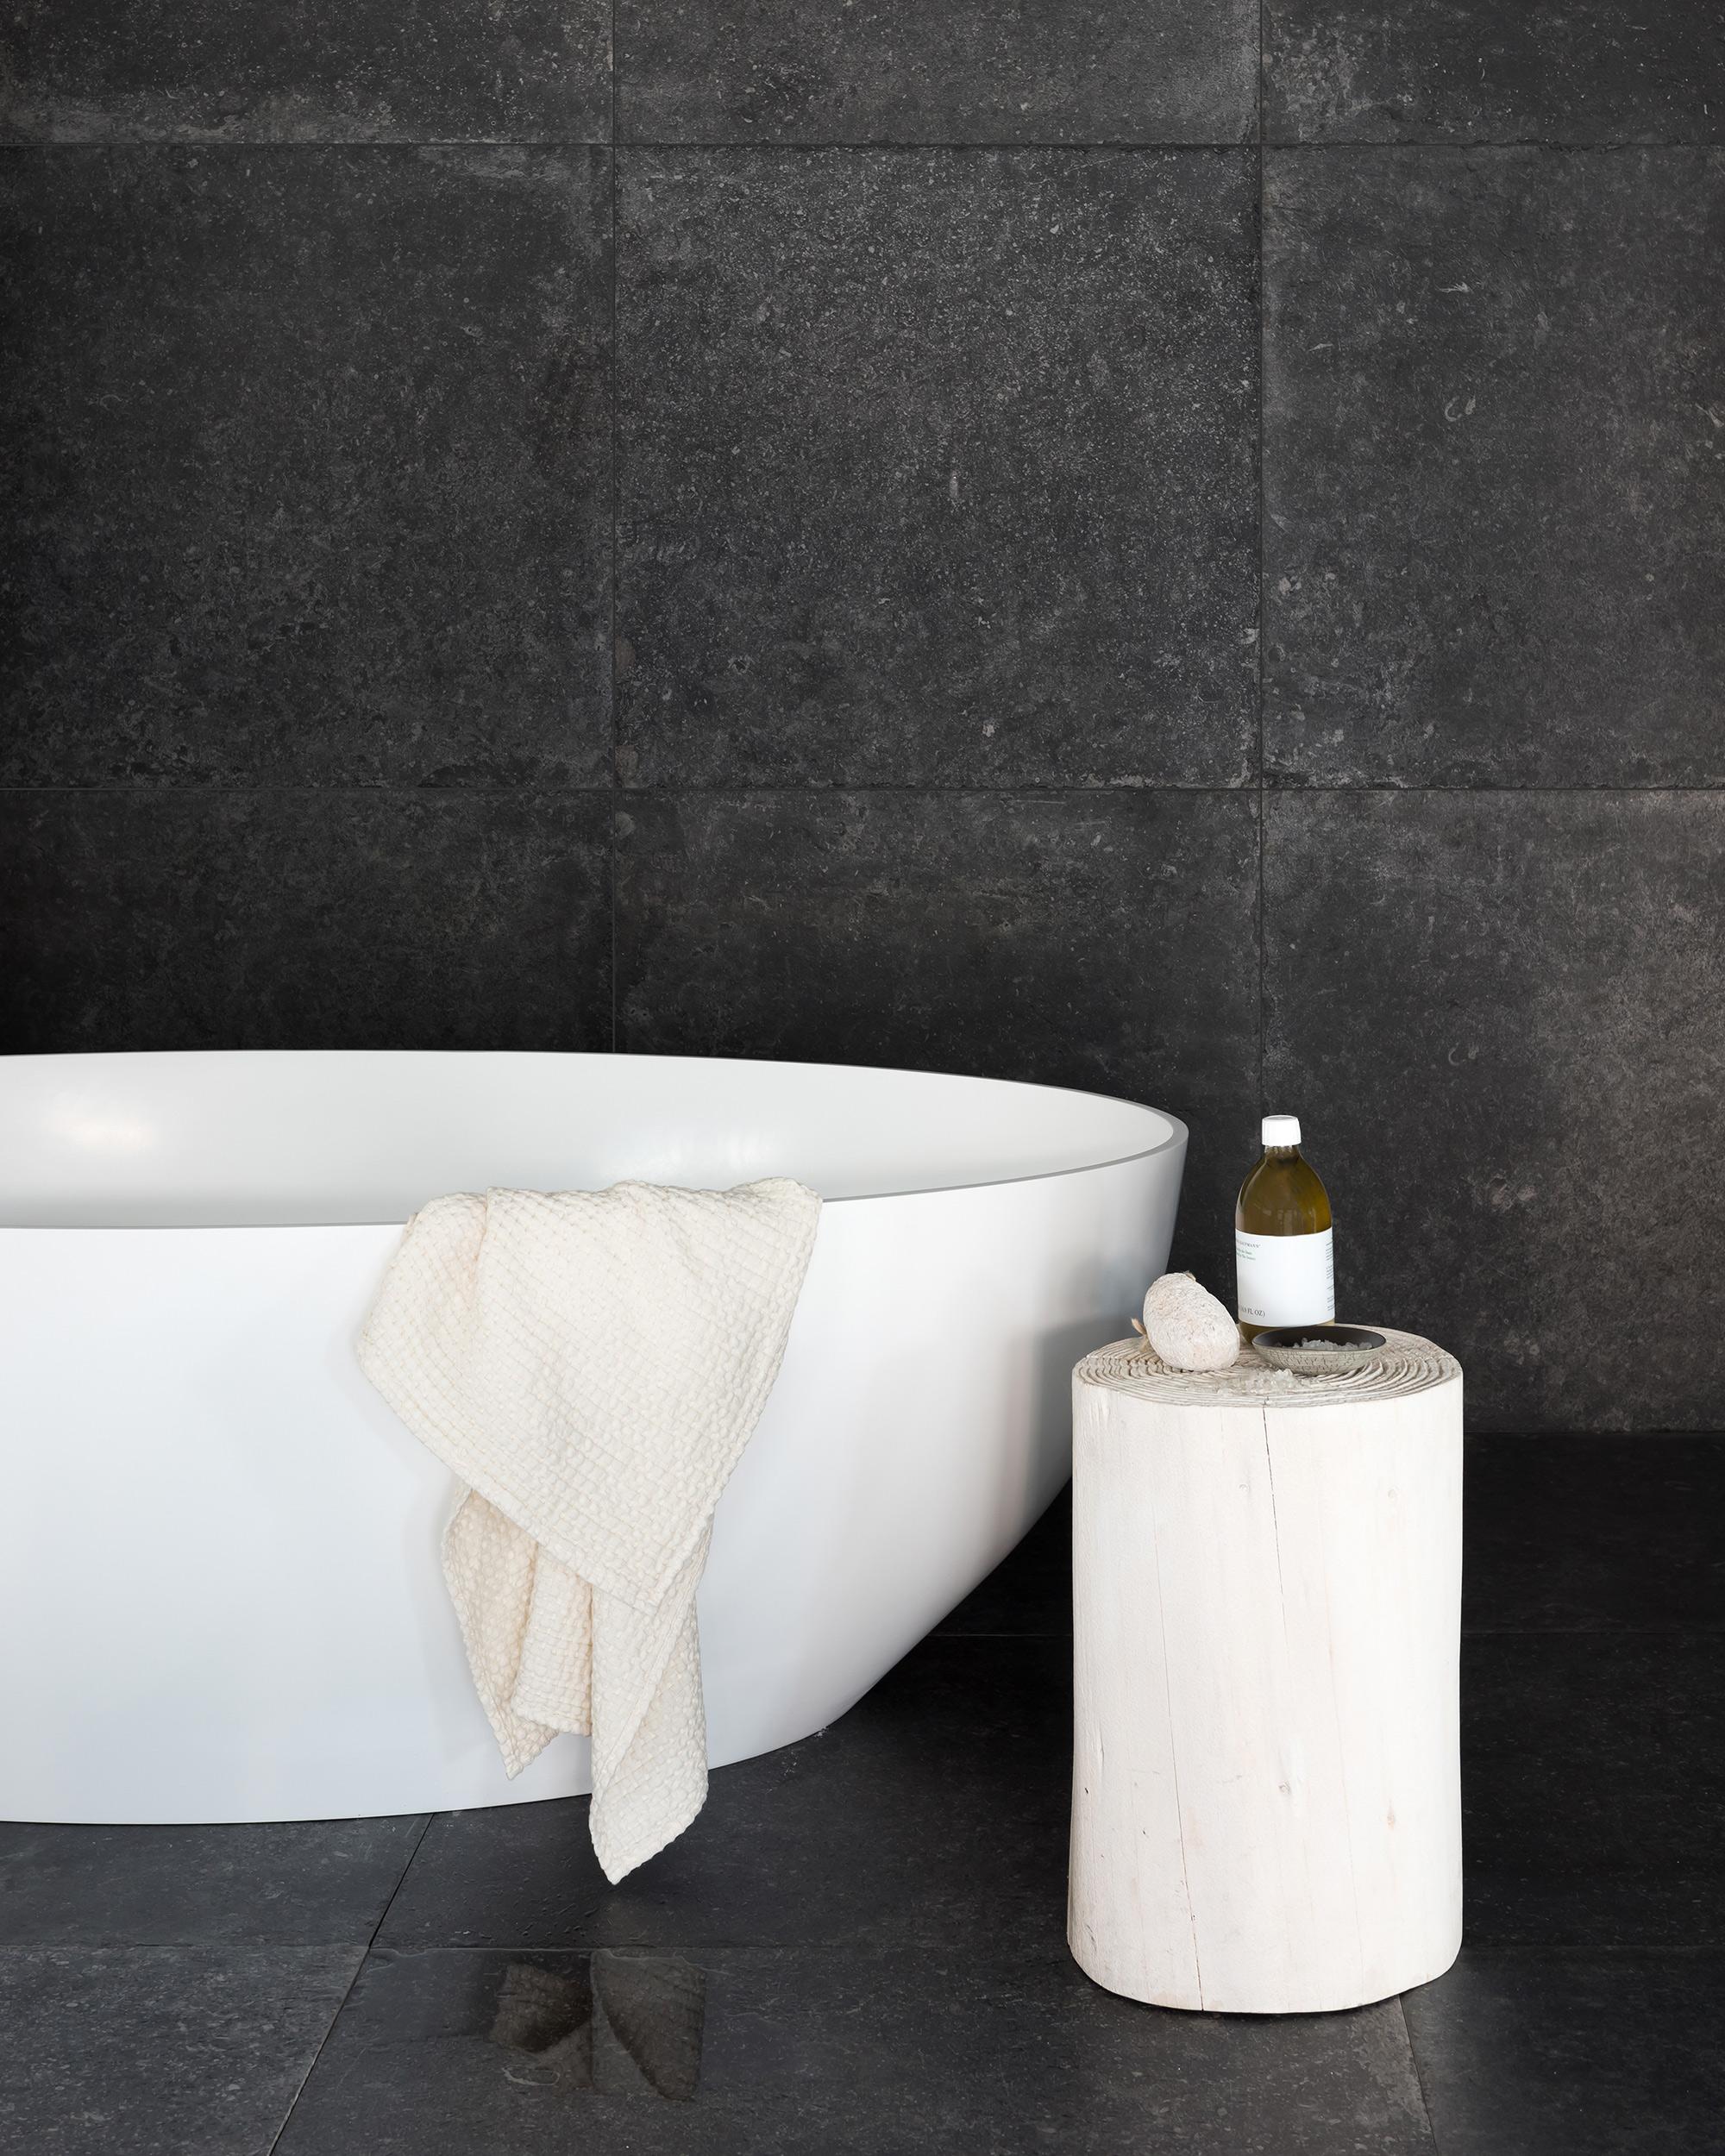 Piet Boon Giant Tile Black